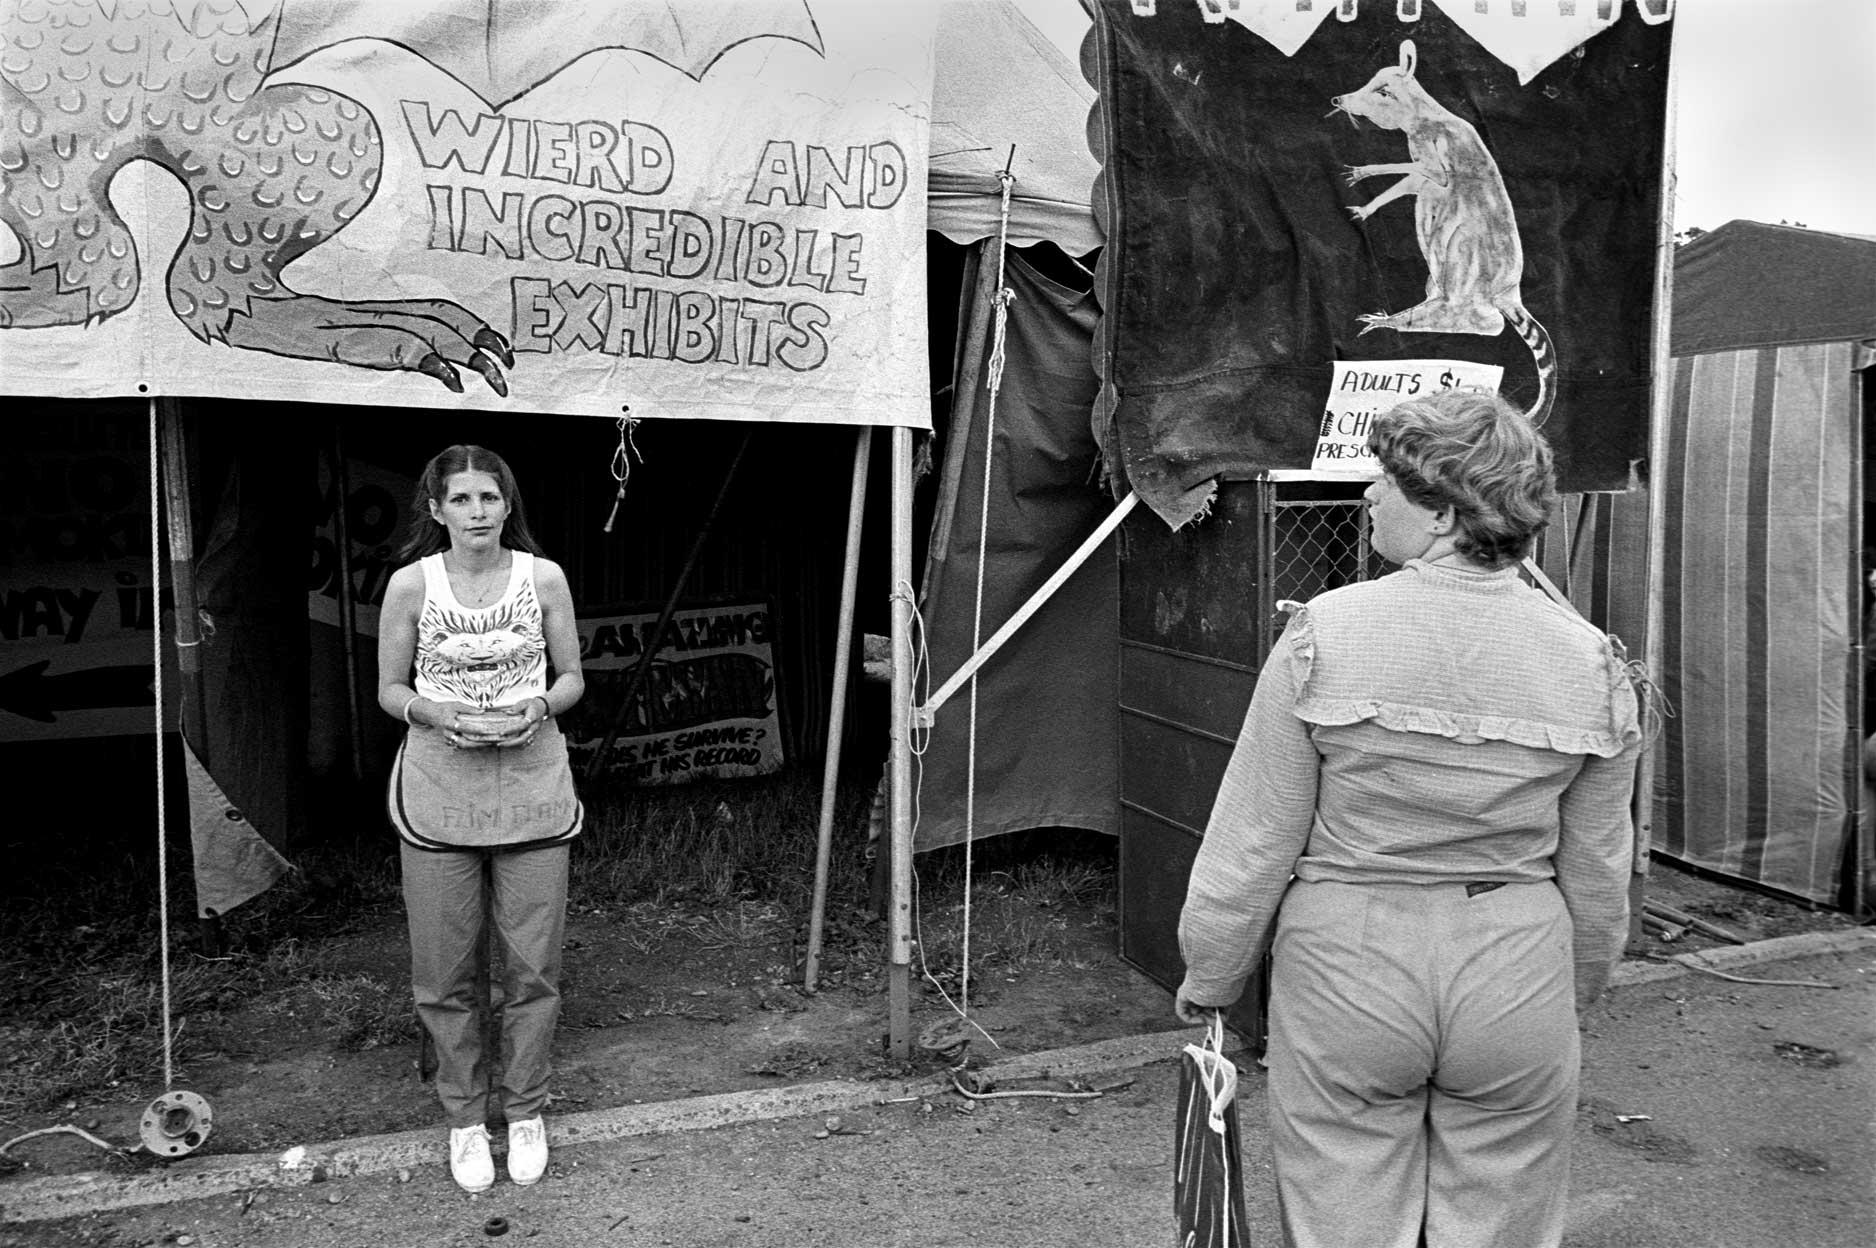 A&P Show, Christchurch, 1982